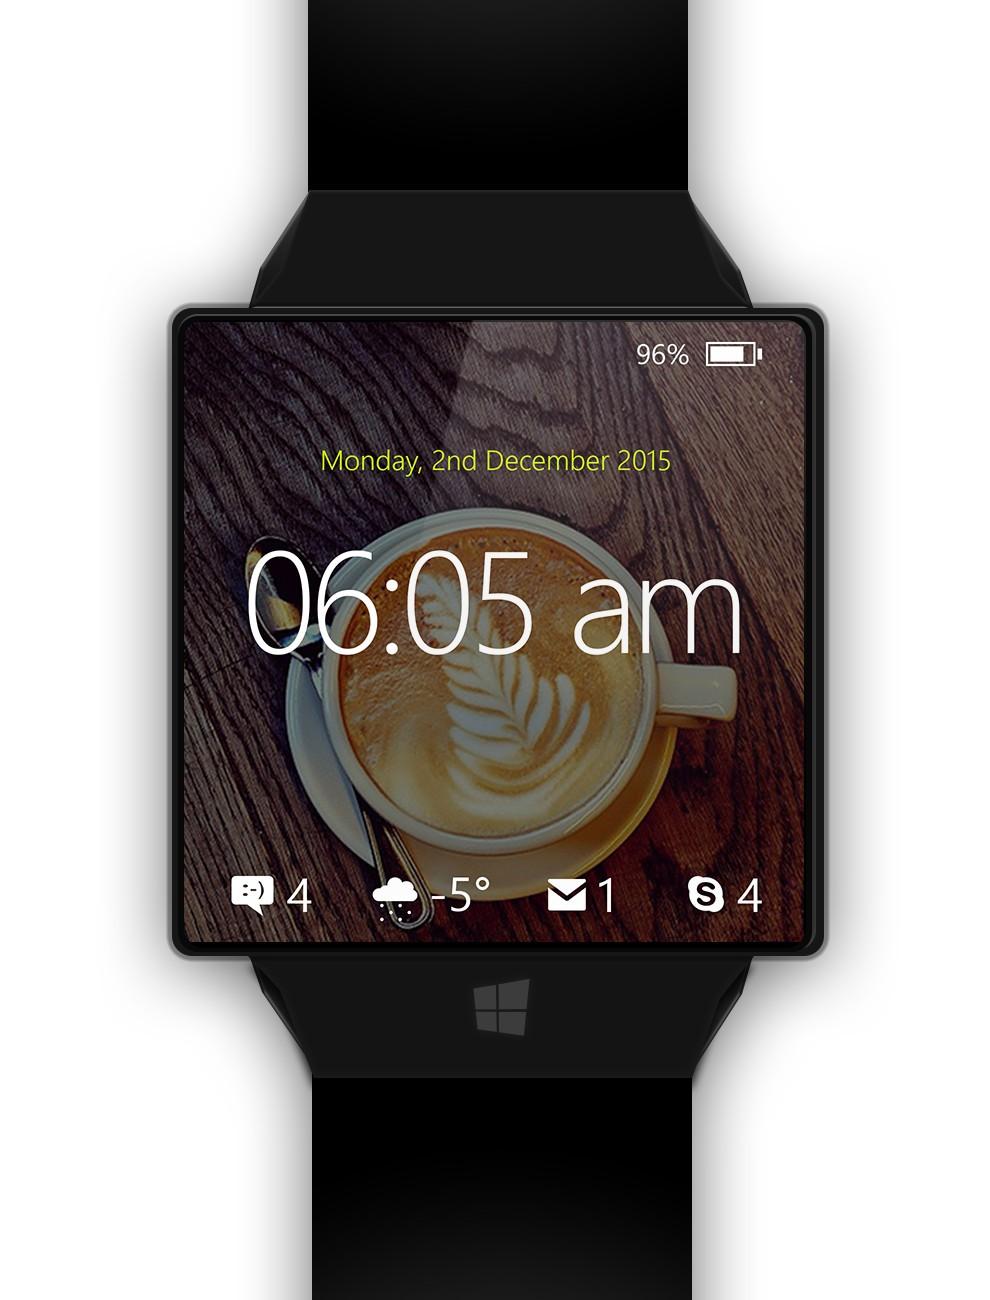 Windows Watch Concept Brings Cortana on Your Wrist